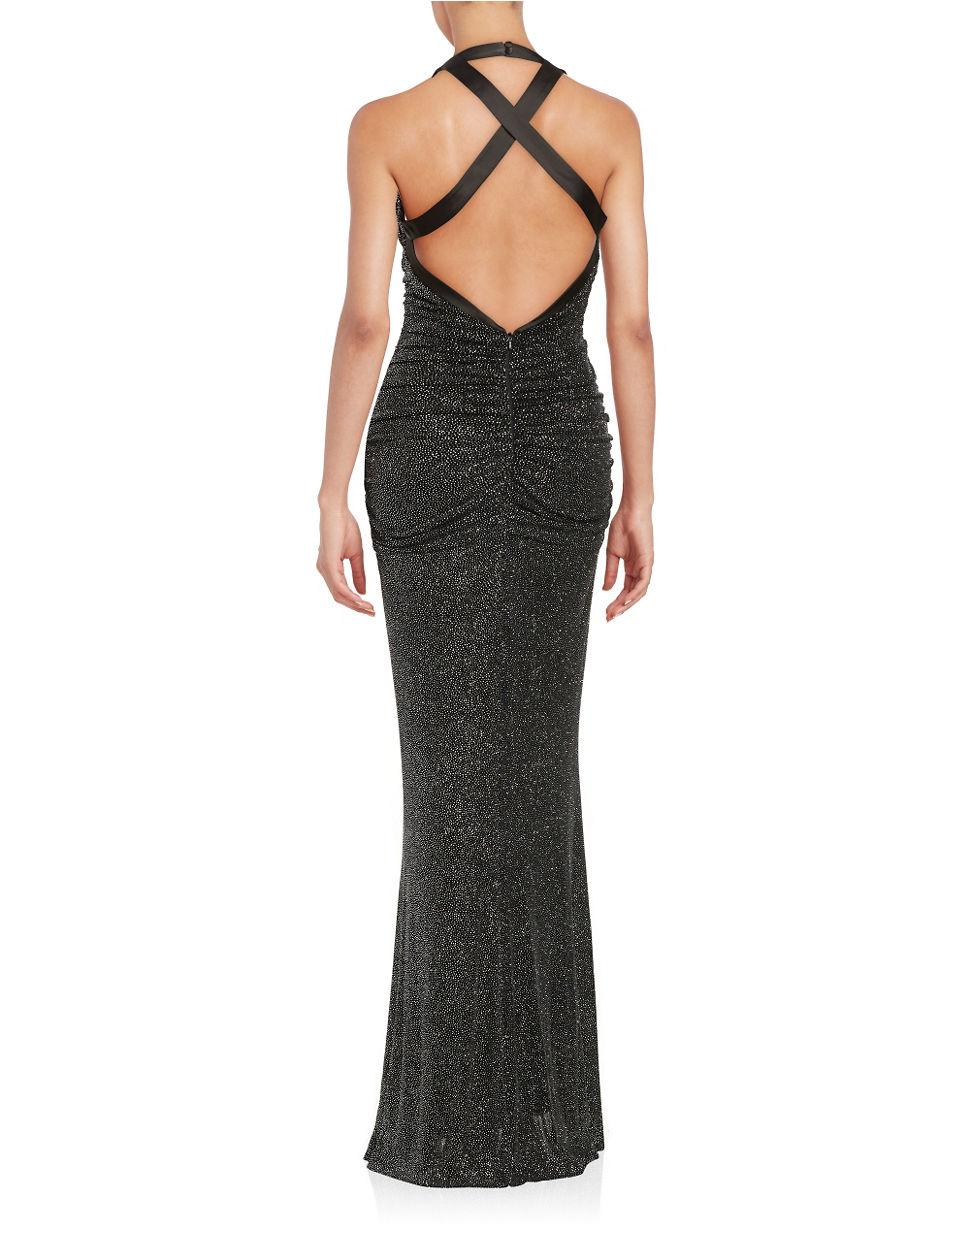 Lyst - Calvin Klein Ruched Shimmer Gown in Black